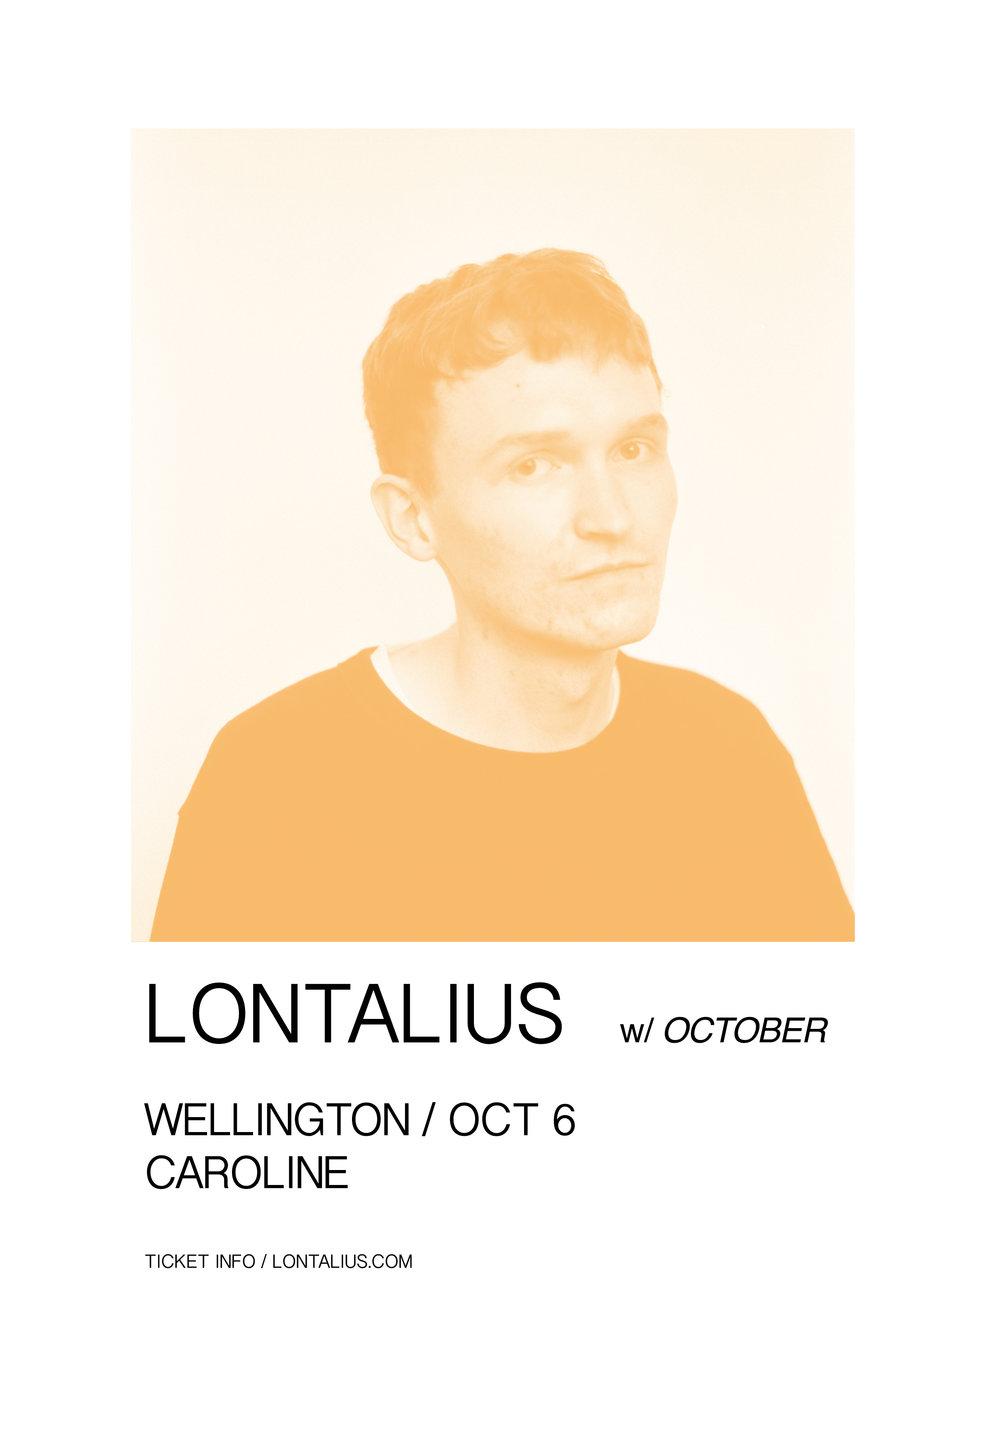 Lontalius-Wellington-poster.jpg